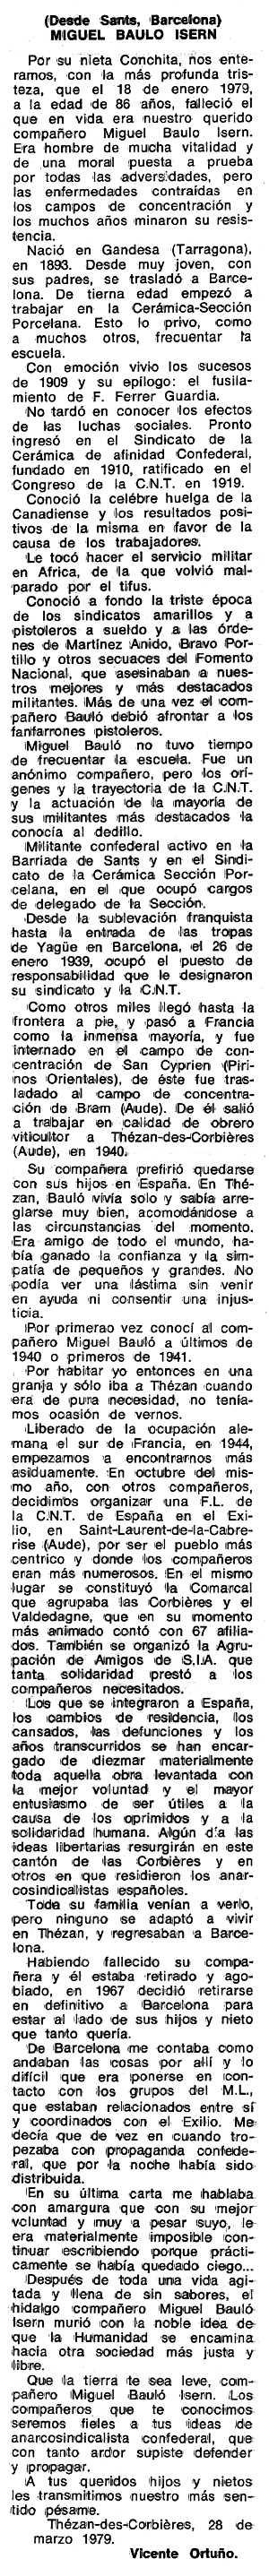 "Necrològica de Miquel Bauló Isern apareguda en el periòdic tolosà ""Espoir"" de l'1 de maig de 1979"